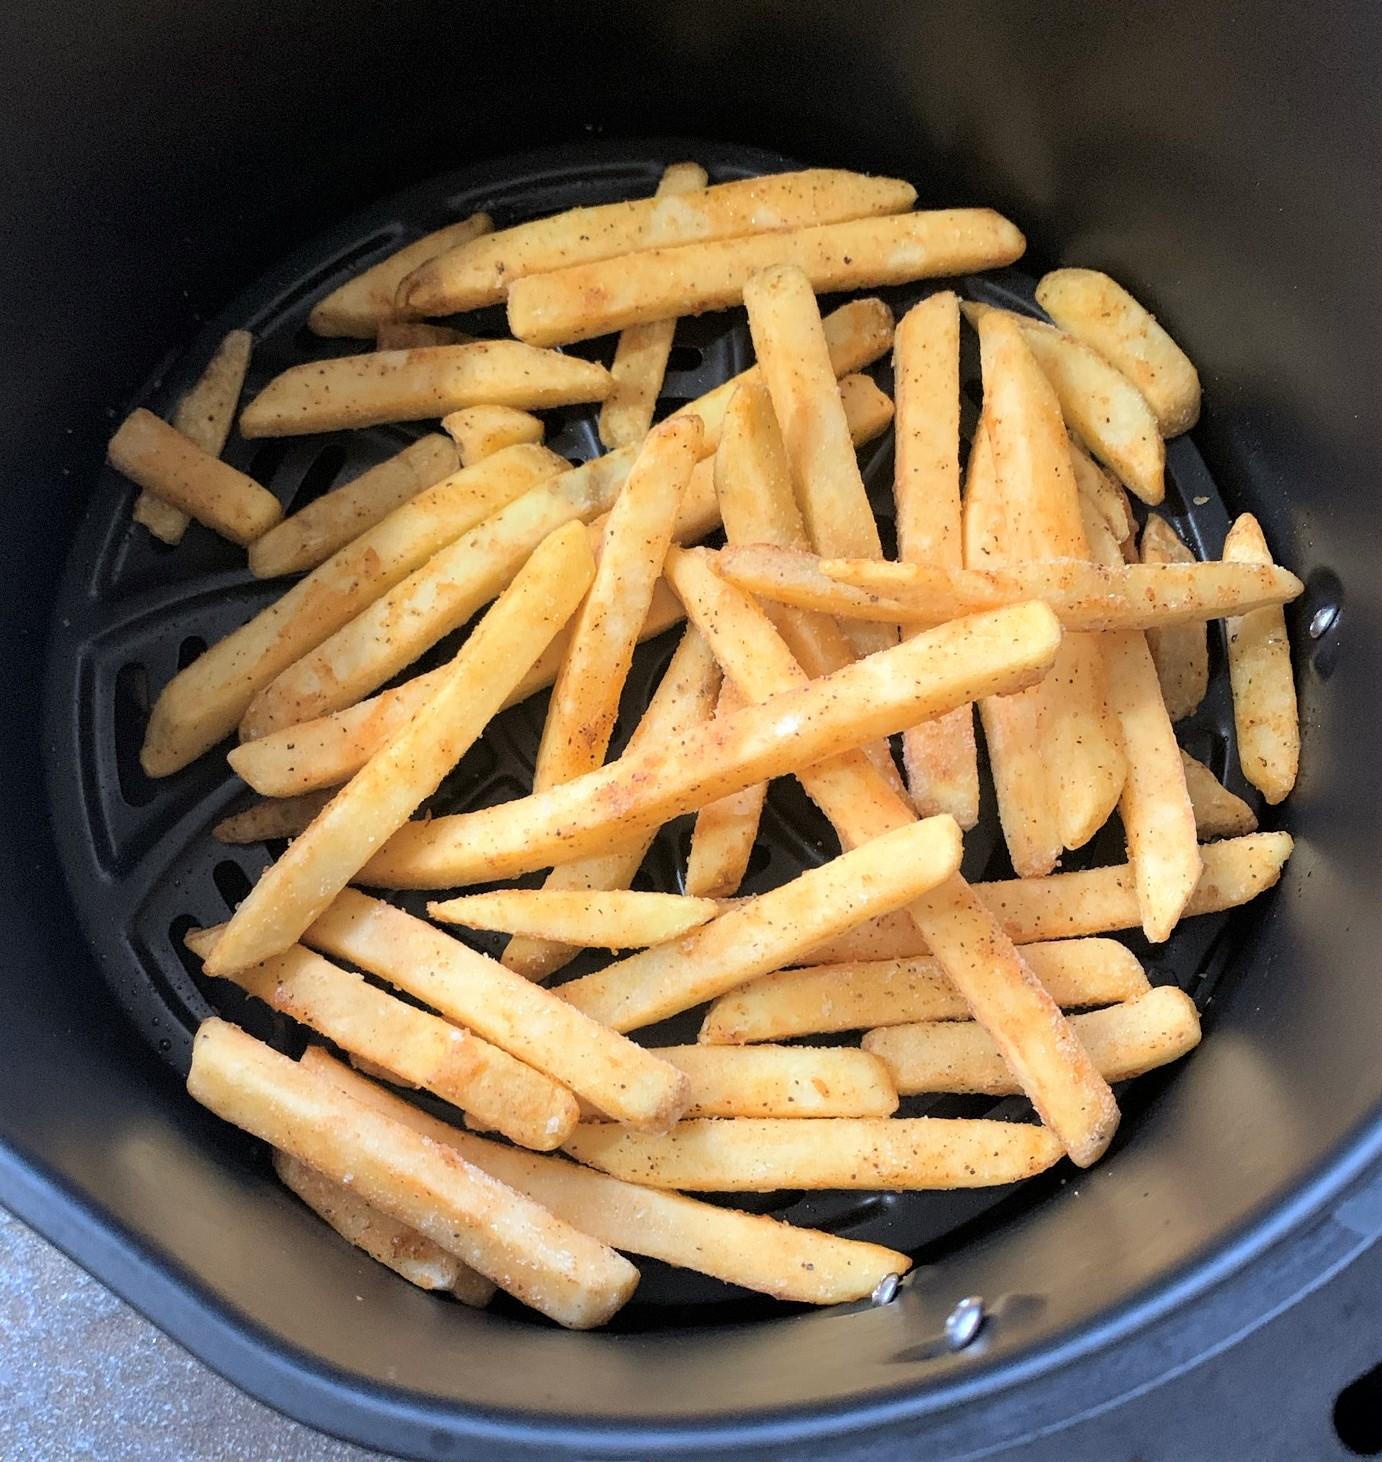 frozen fries in an air fryer basket